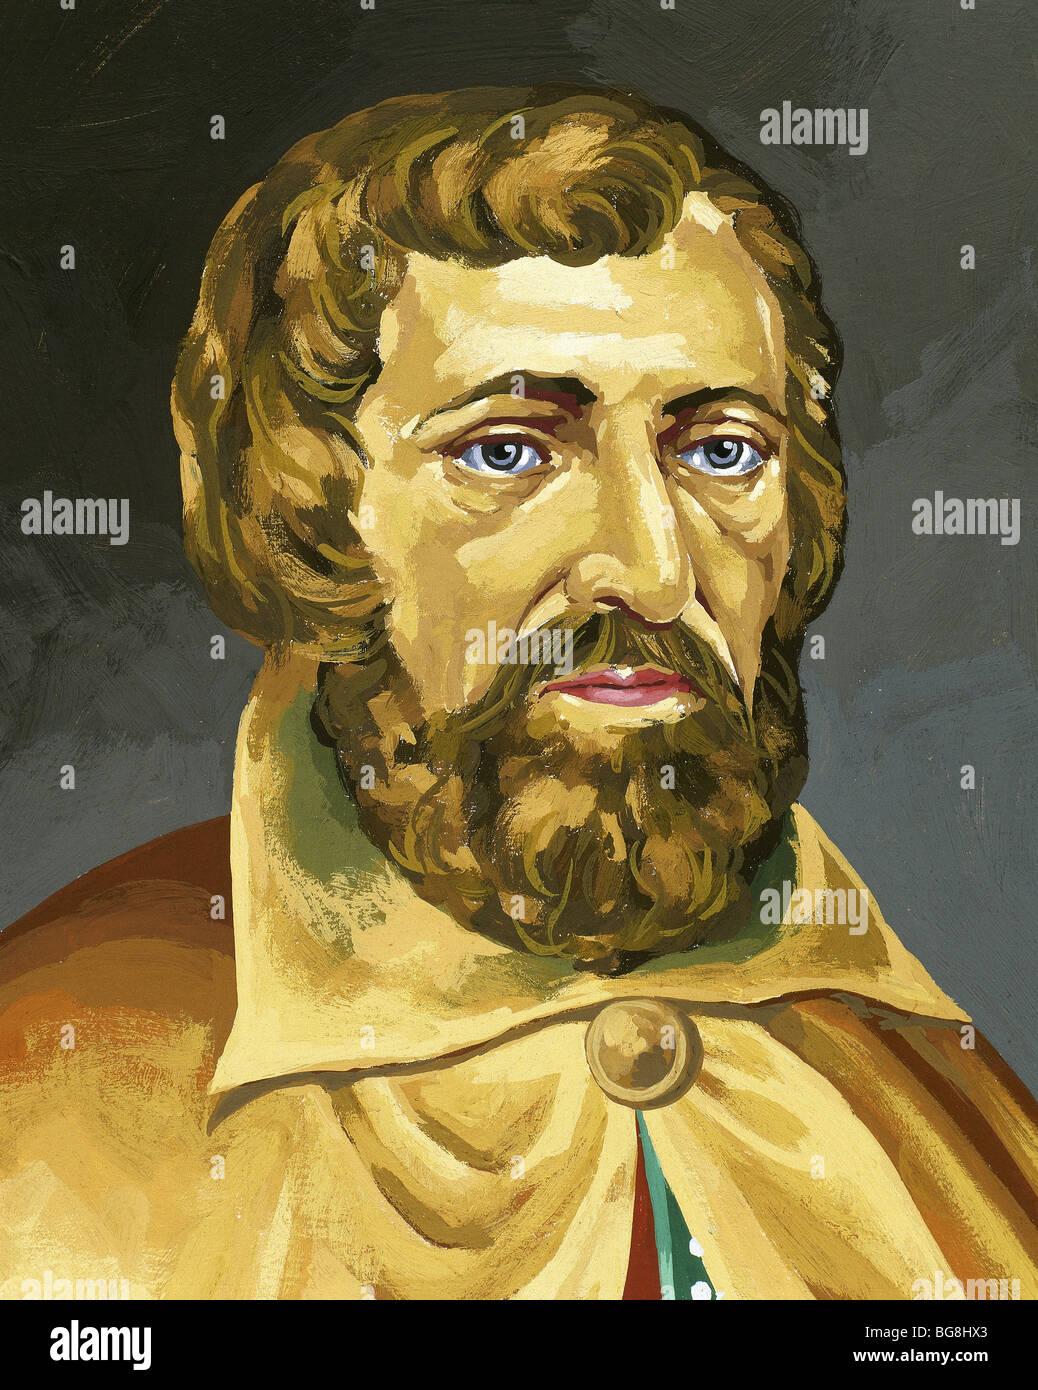 Arnaldus de Villa Nova (Valencia, h.1230-1311). Catalan physician, alchemist and astrologer. - Stock Image